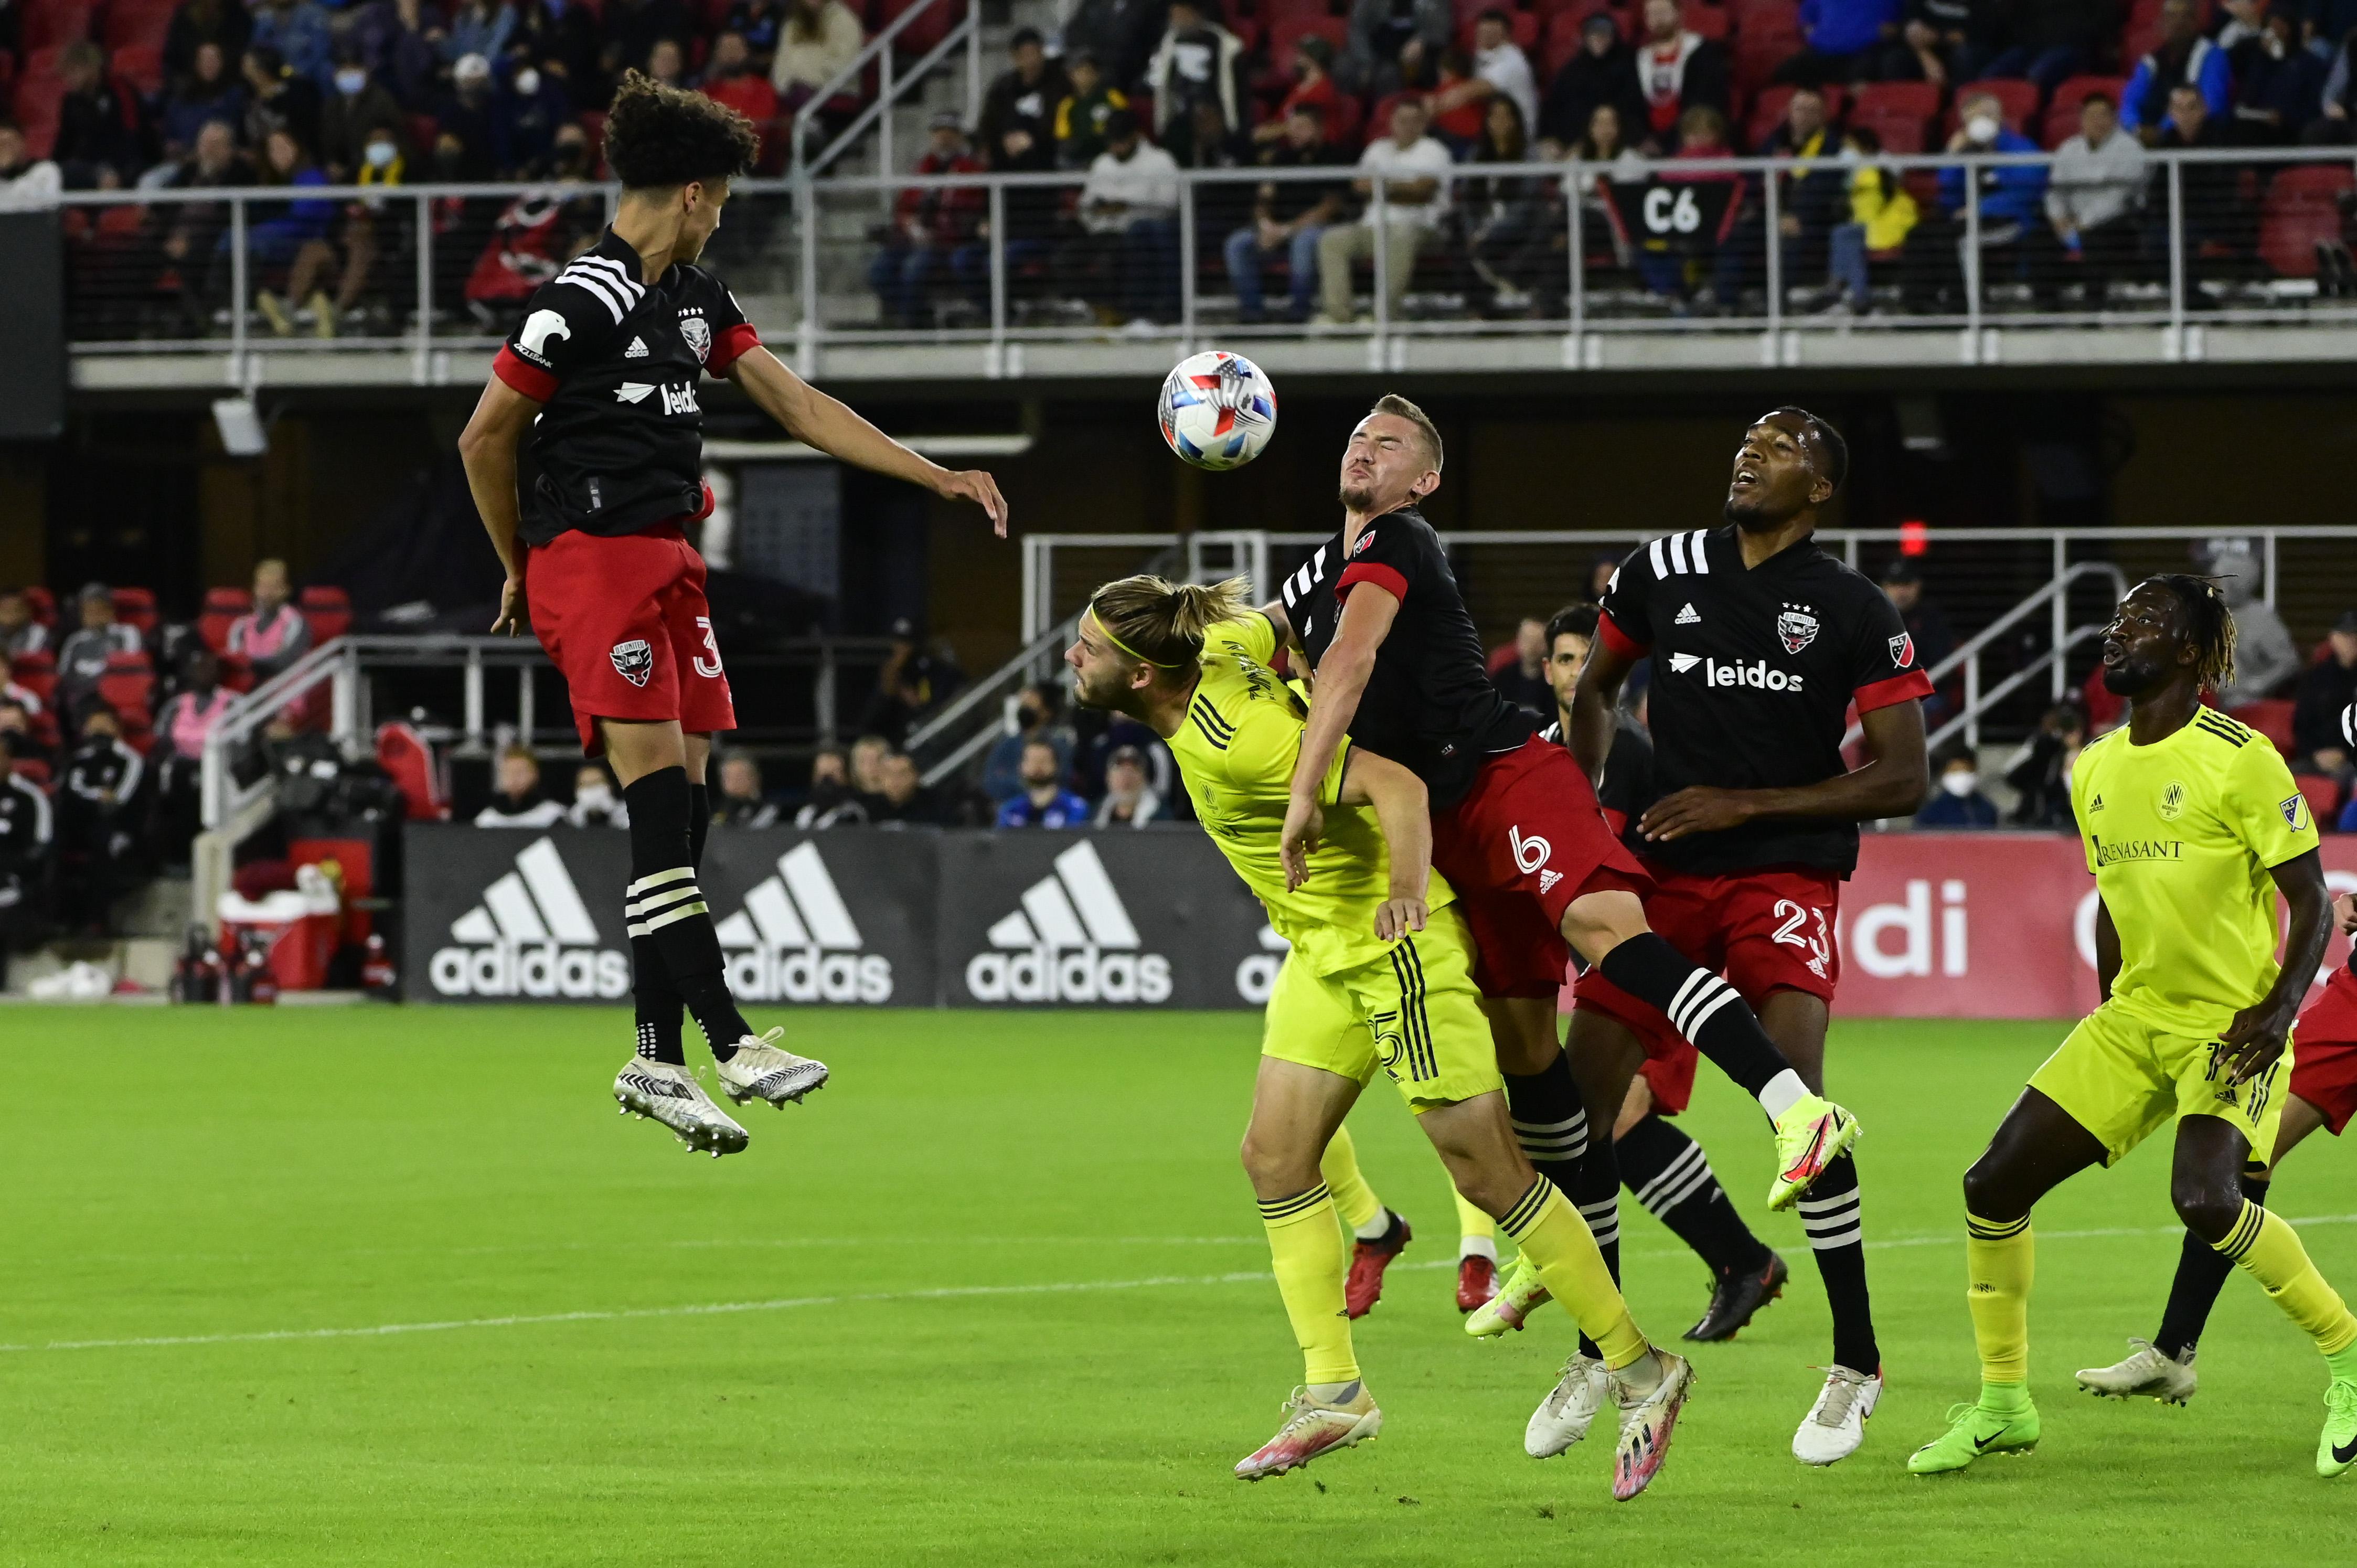 MLS: Nashville SC at D.C. United